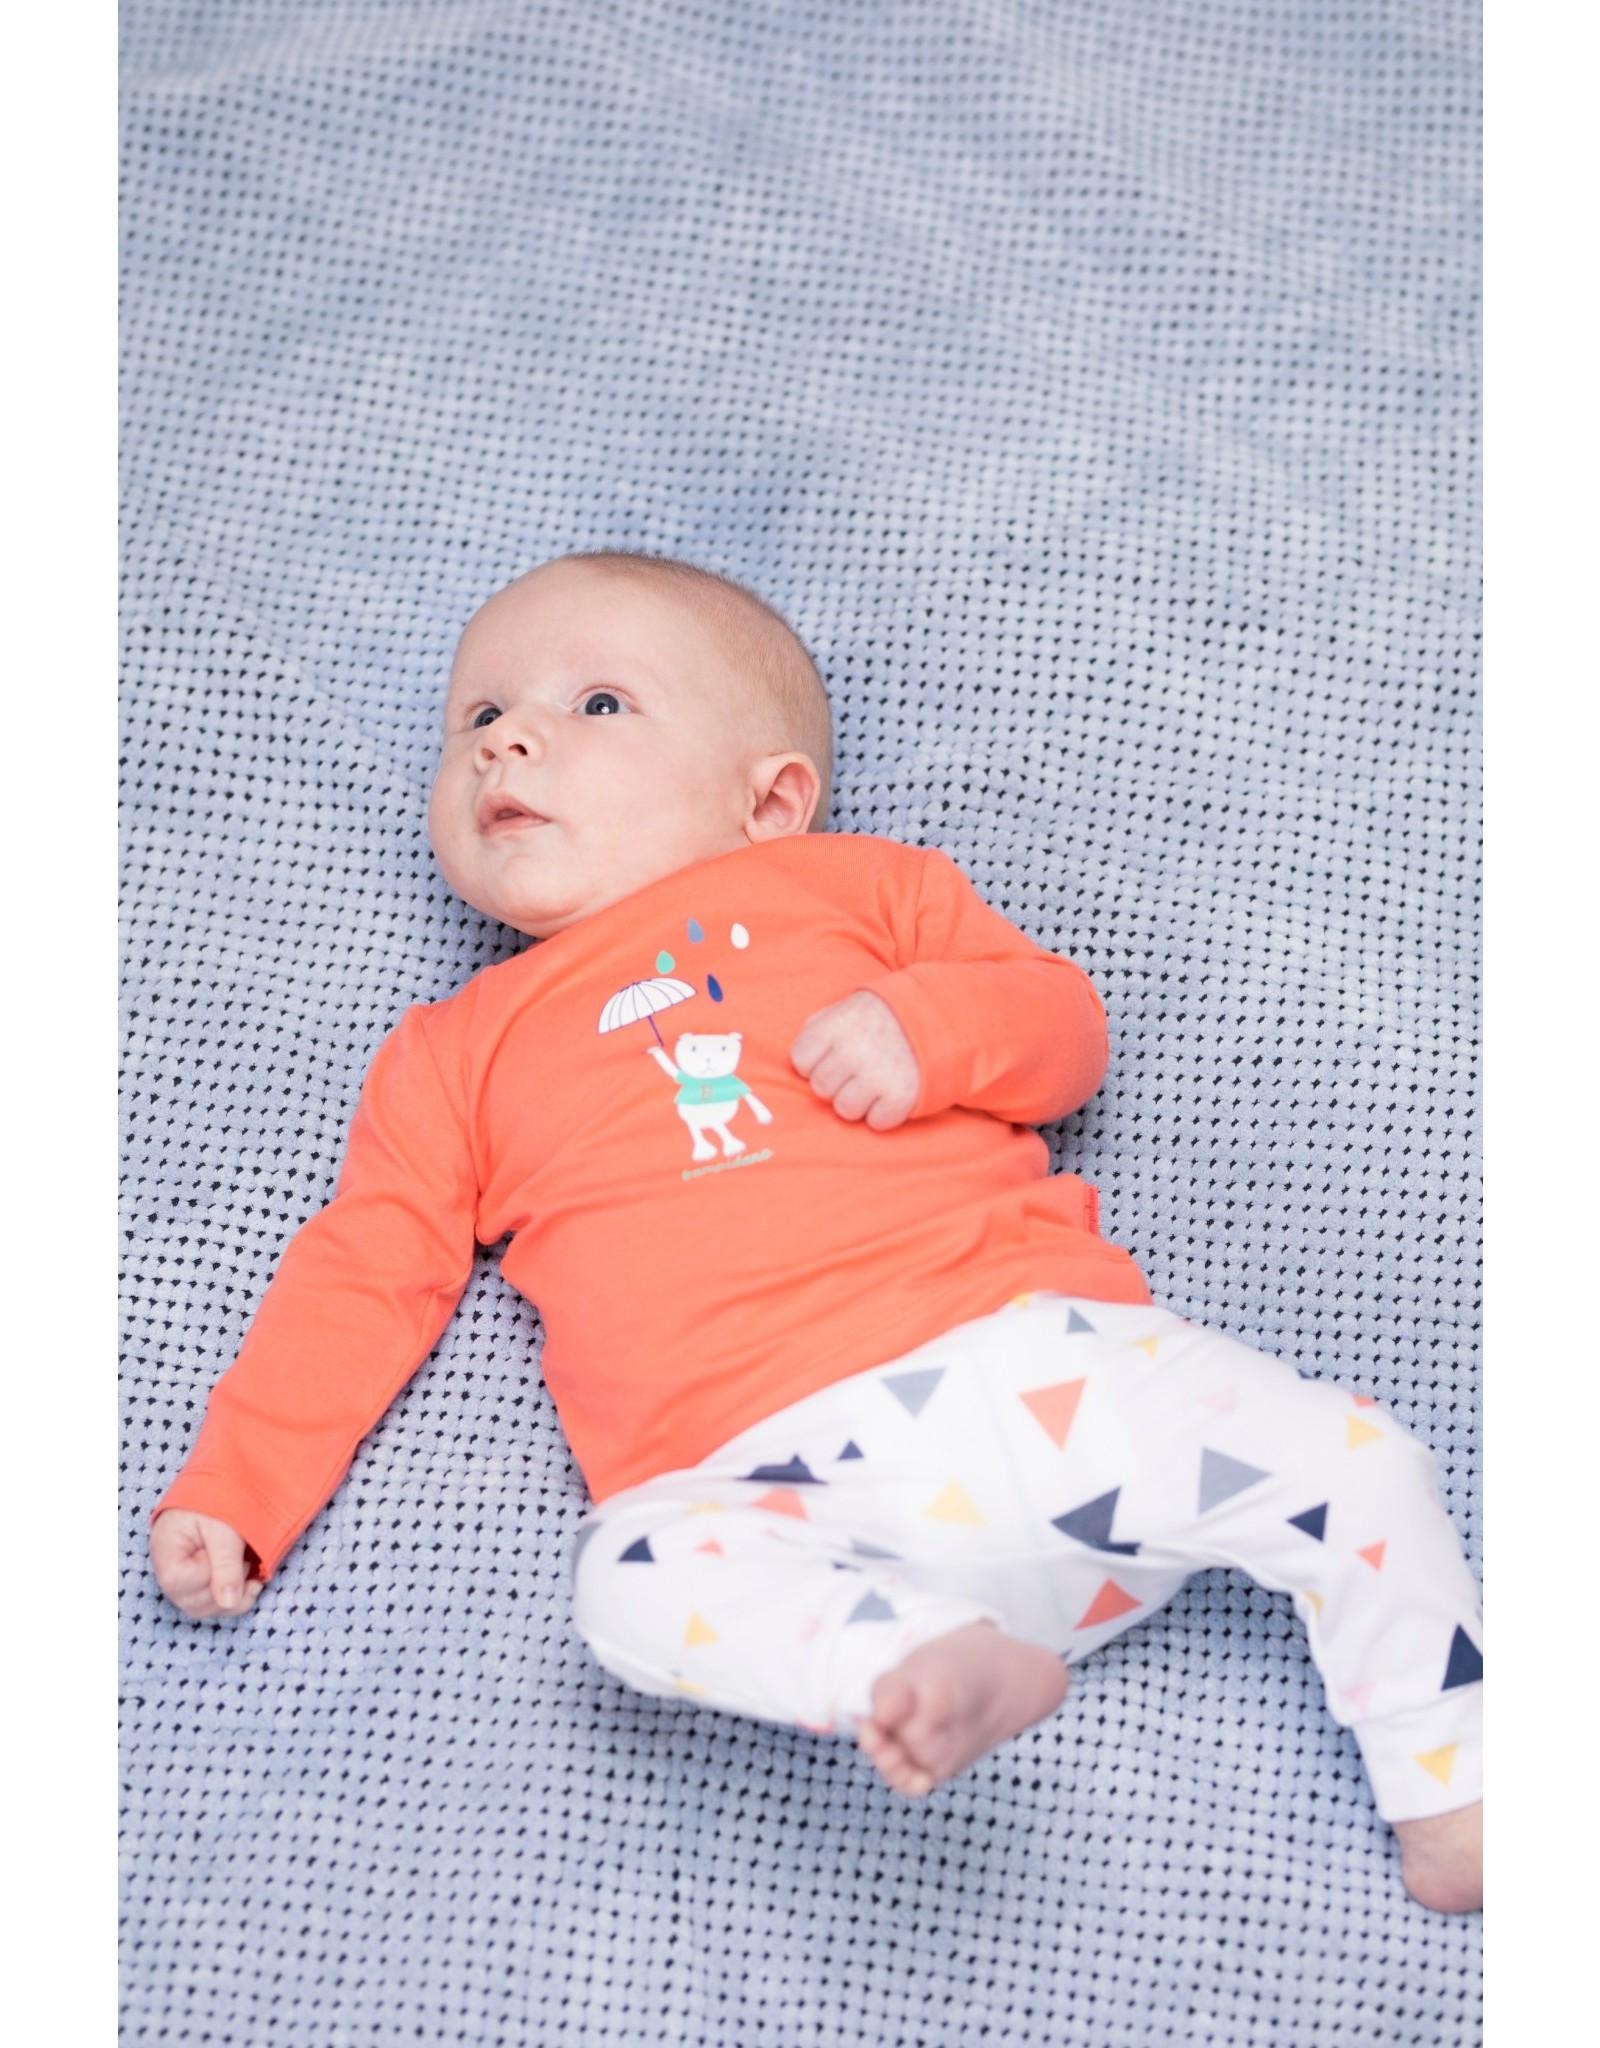 Bampidano Bampidano newborn neutraal joggingbroek Diede White Allover